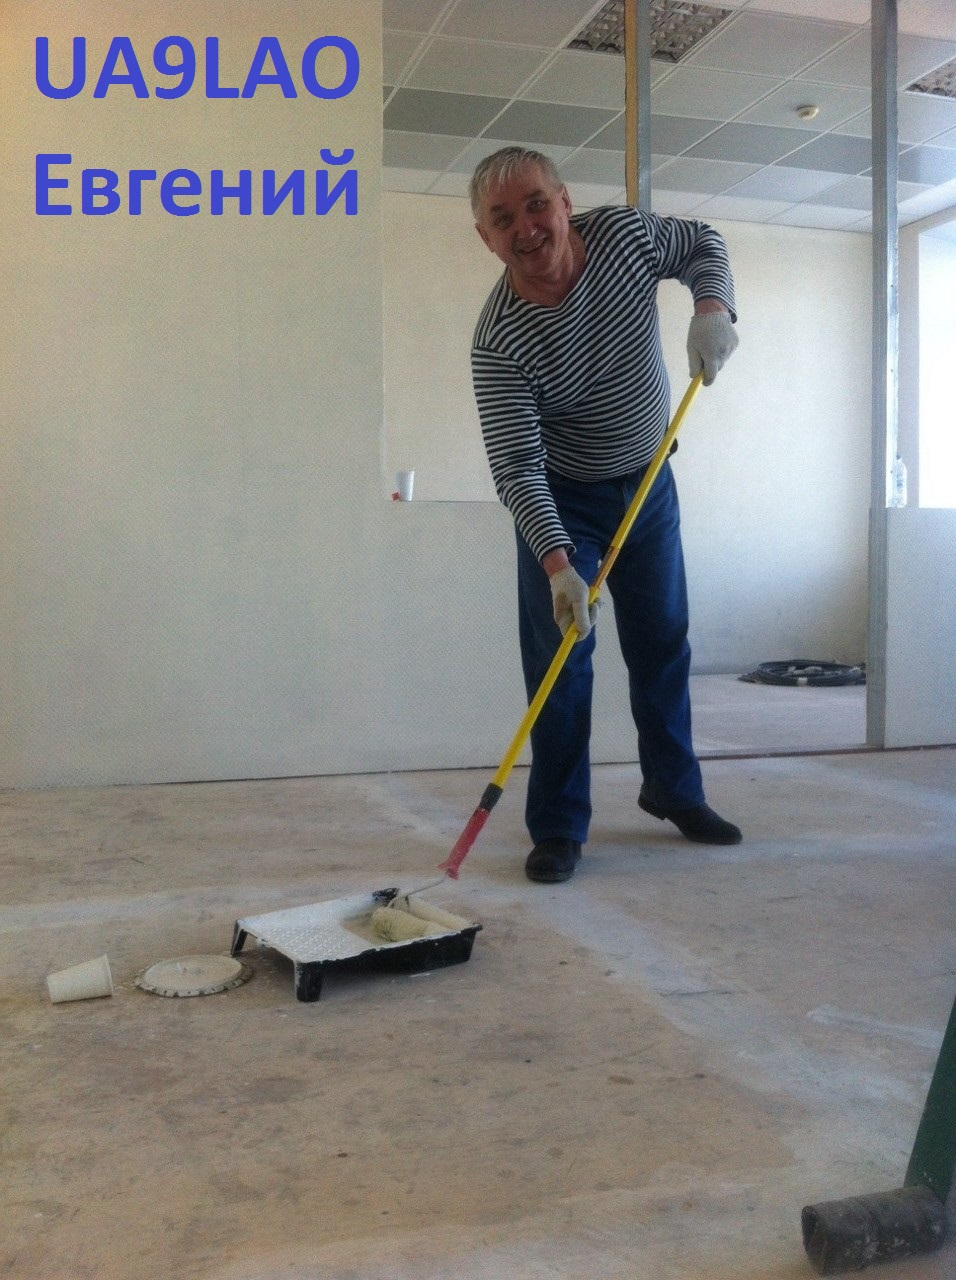 http://se.uploads.ru/8RSIL.jpg